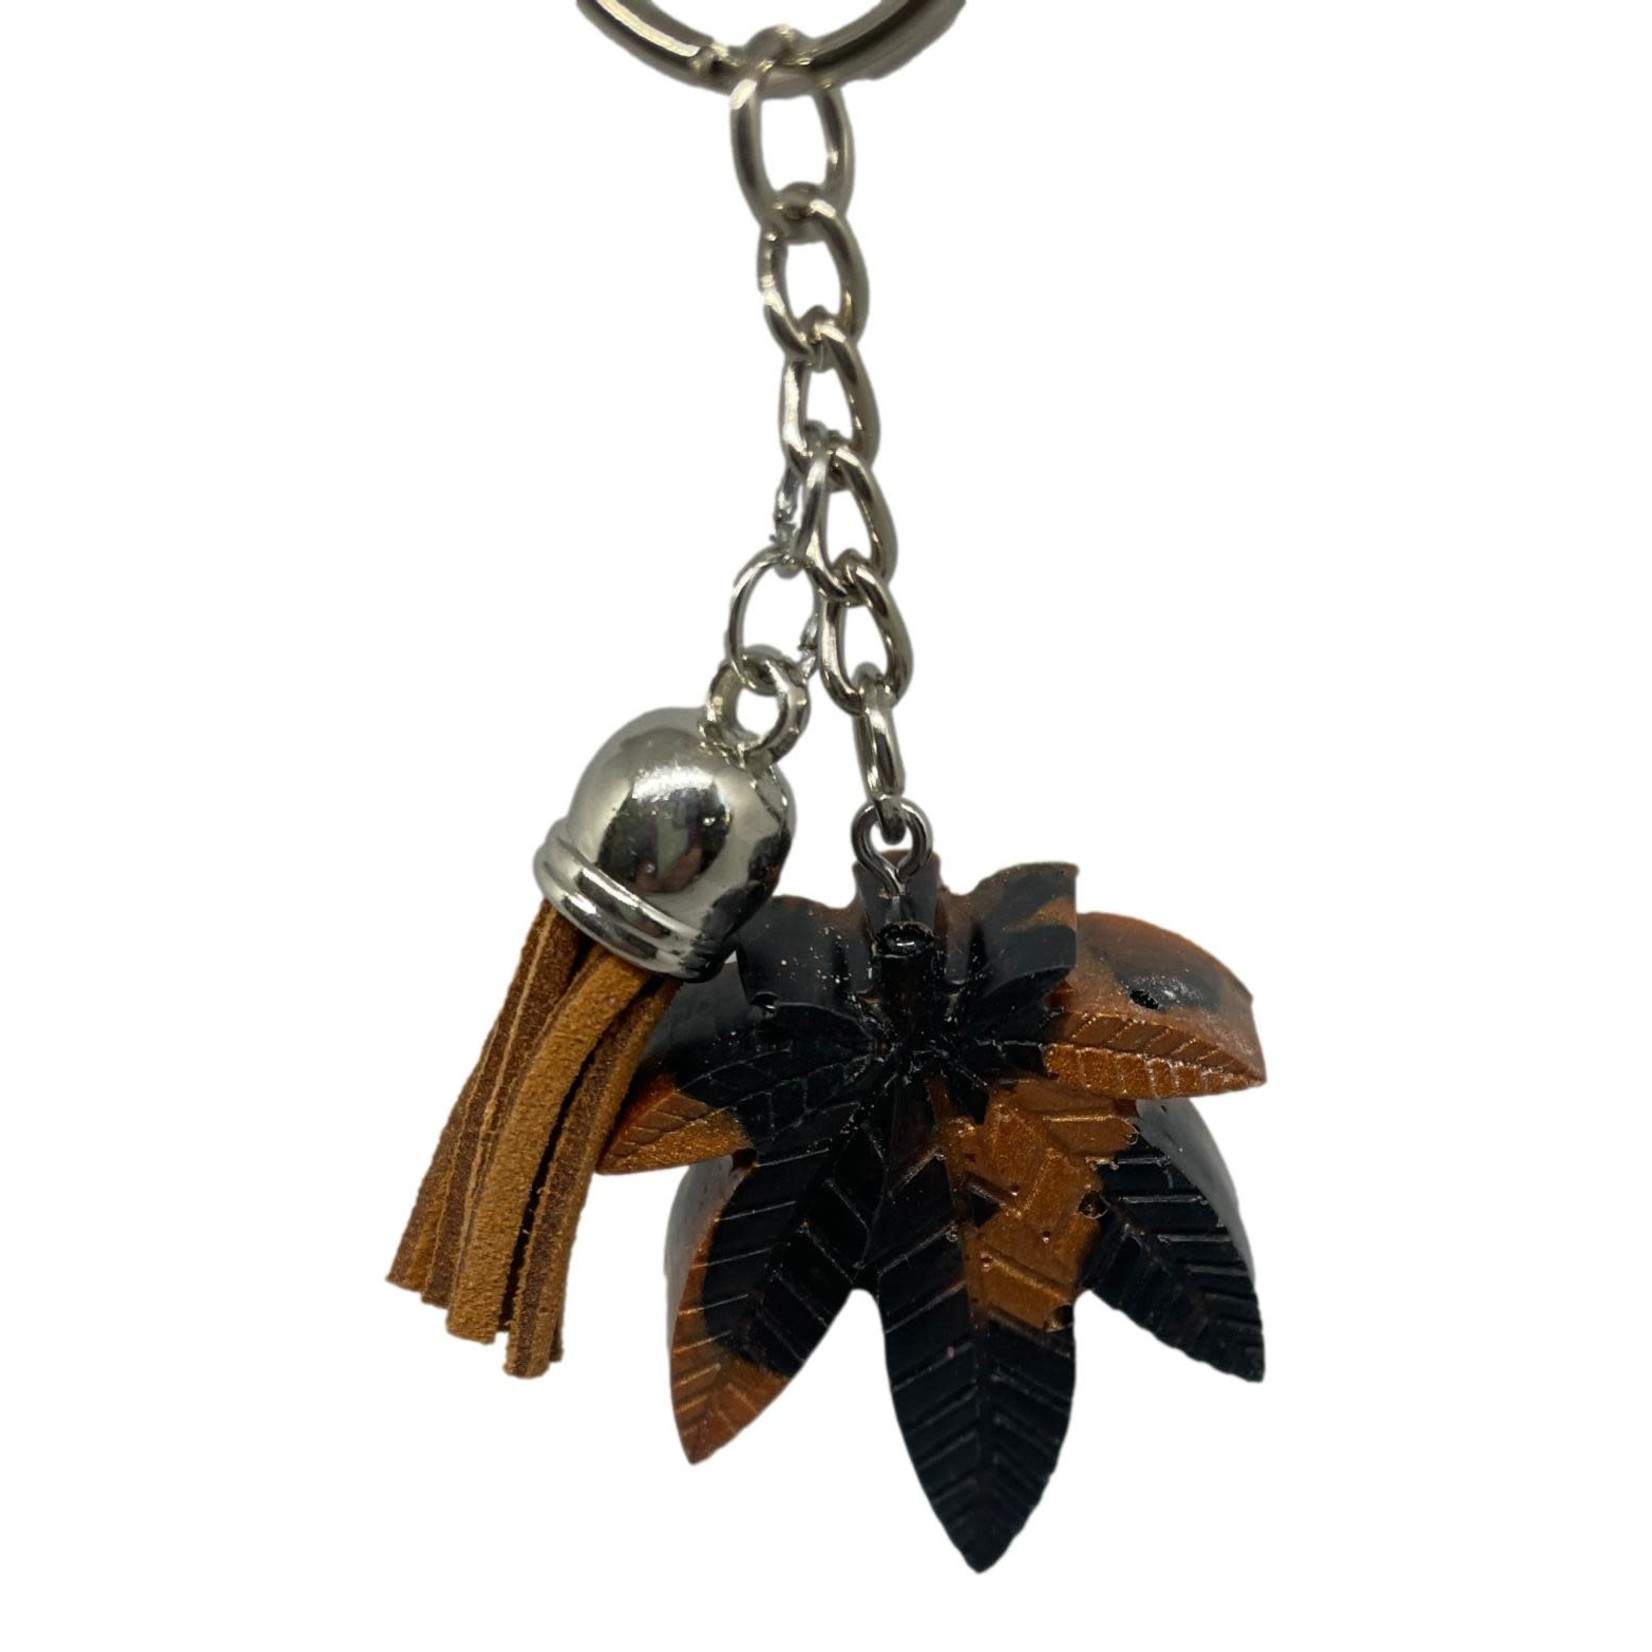 East Coast Sirens Black & Copper Pot Leaf Key Chain